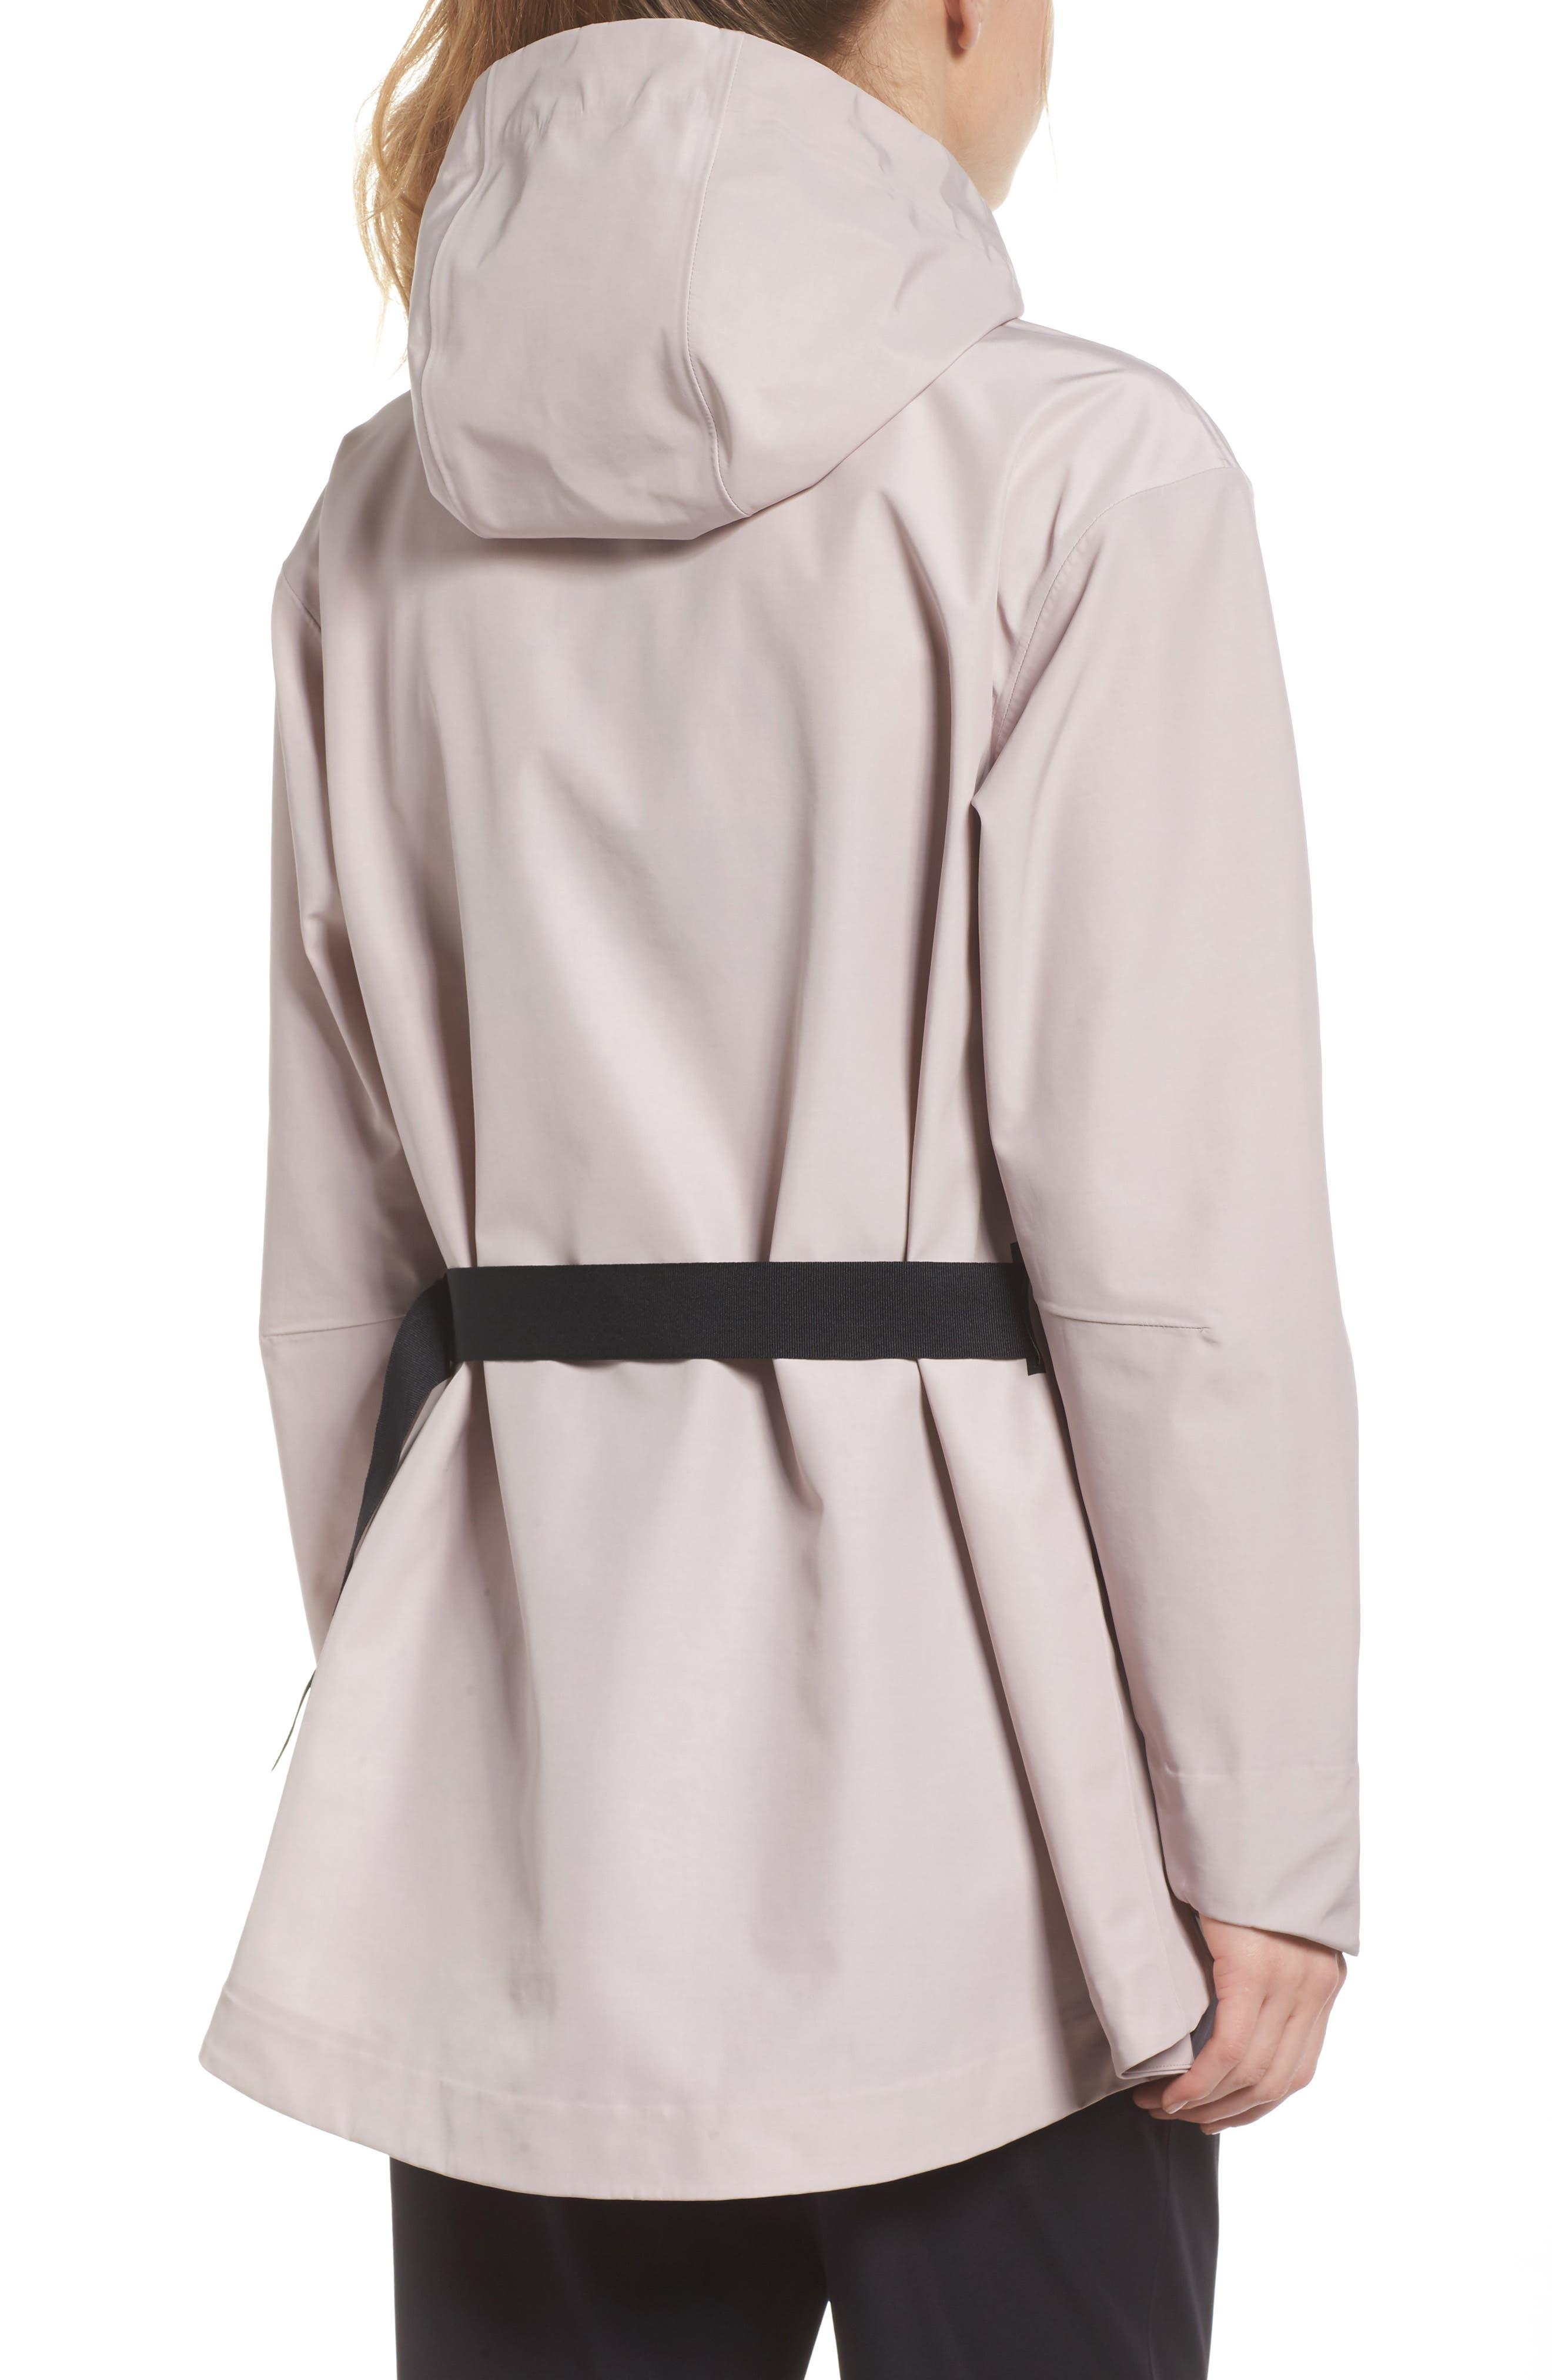 Sportswear Women's Tech Jacket,                             Alternate thumbnail 2, color,                             Particle Rose/ Black